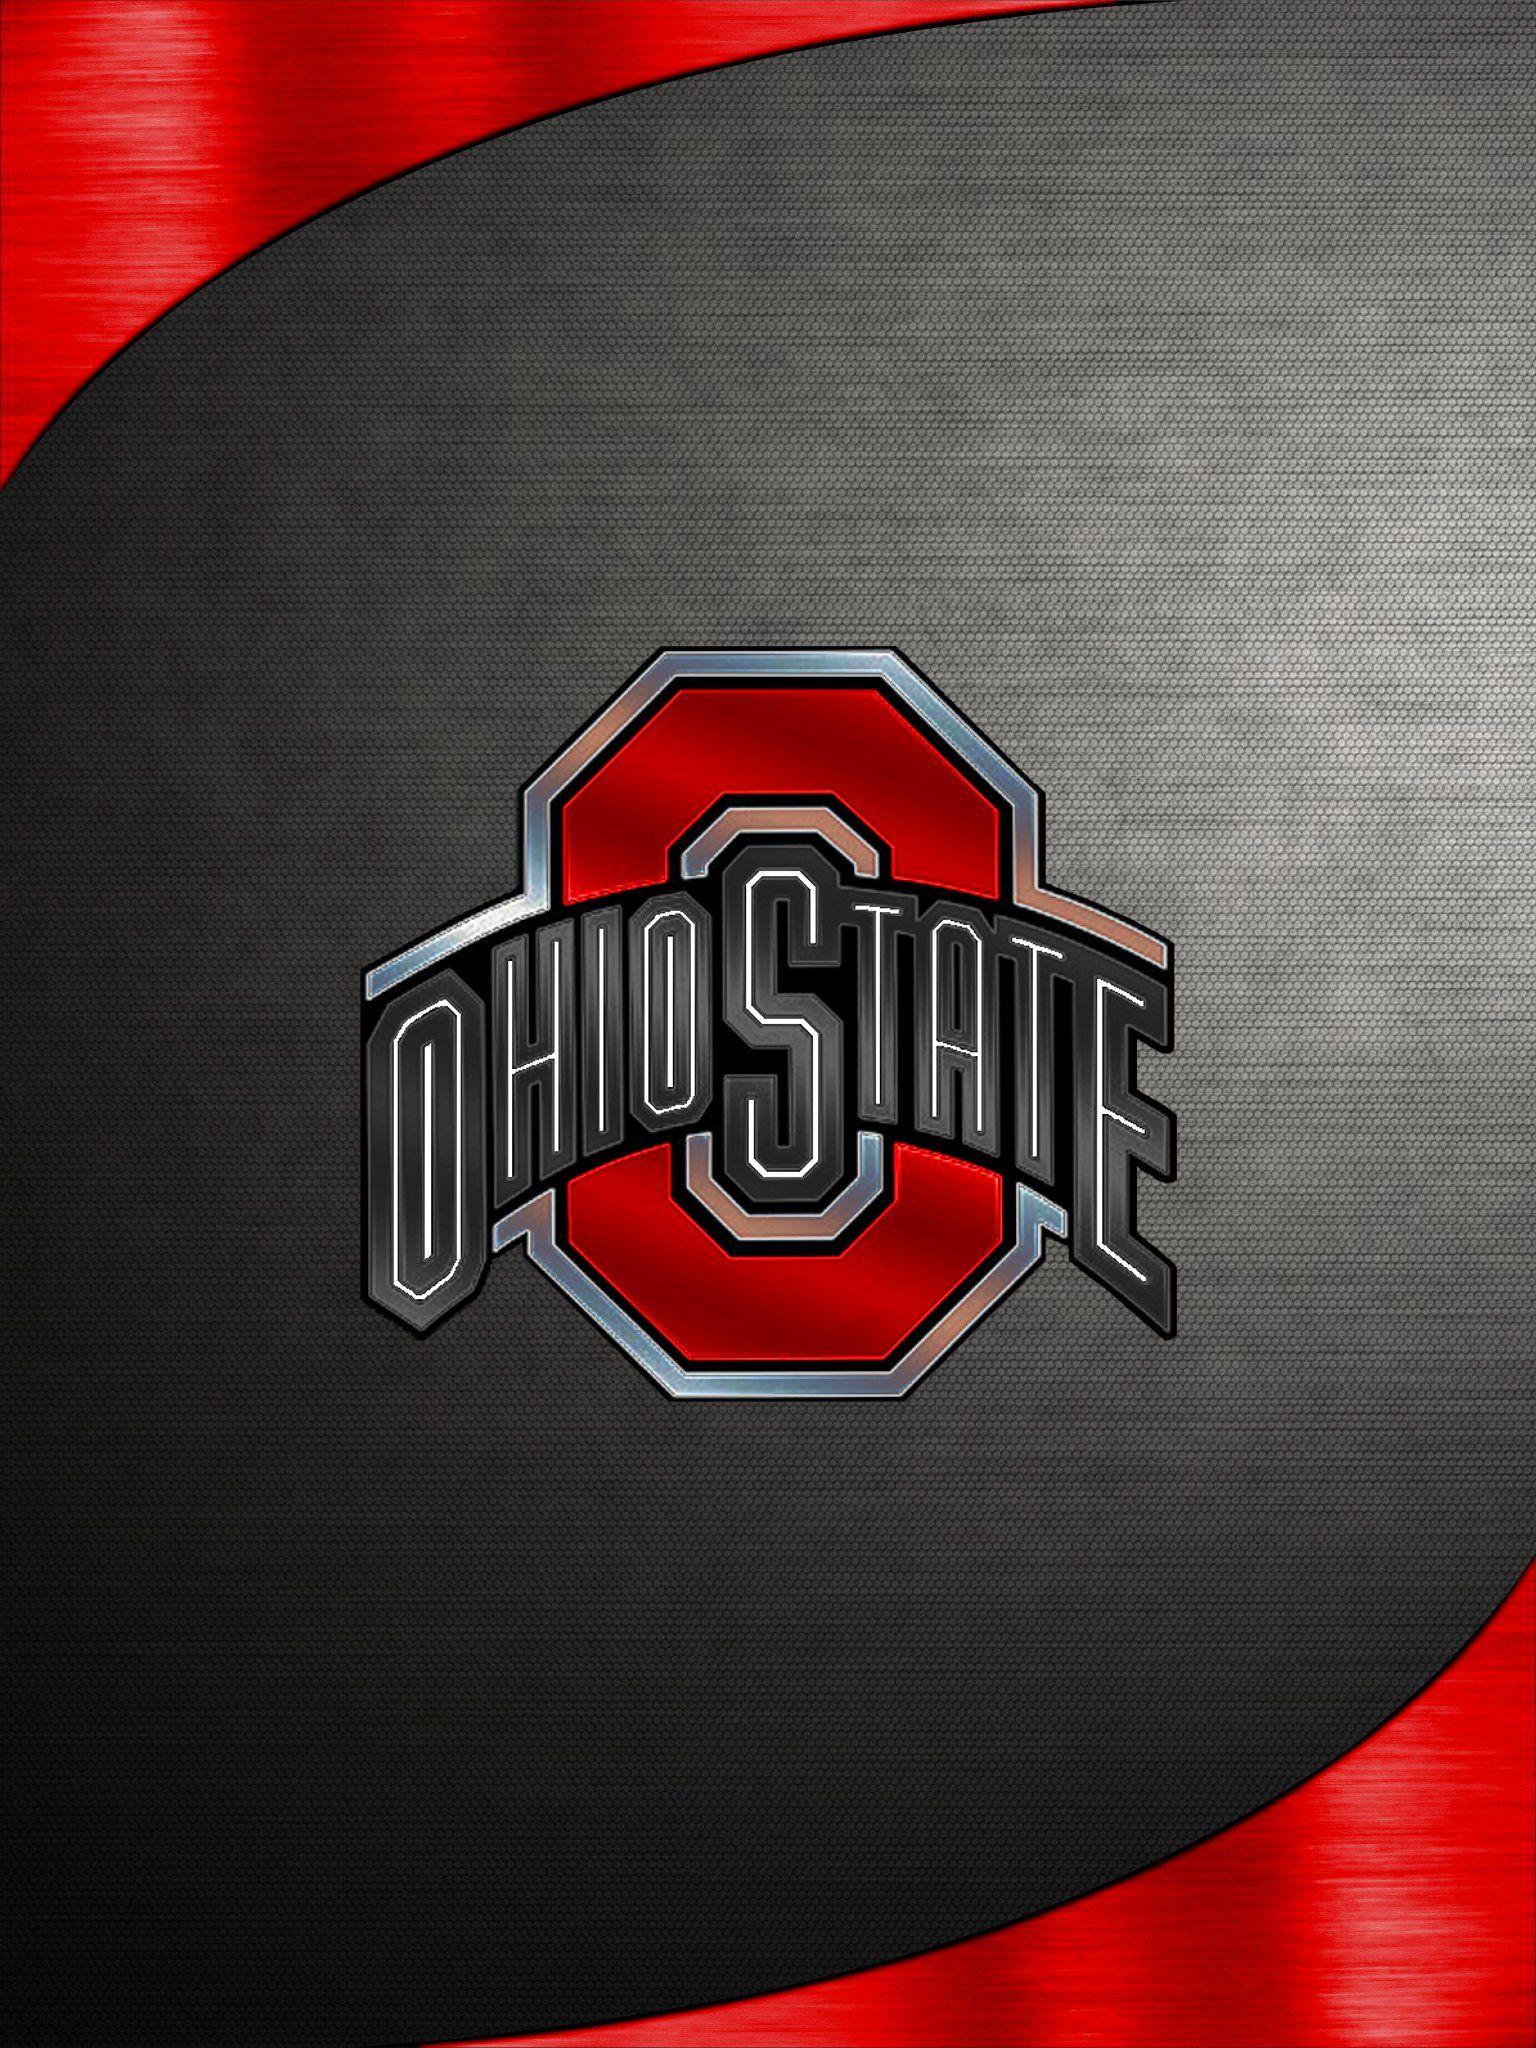 Ohio State Football Photo Osu Ipad 2 Wallpaper 41 Ohio State Buckeyes Football Logo Ohio State Football Ohio State Buckeyes Football